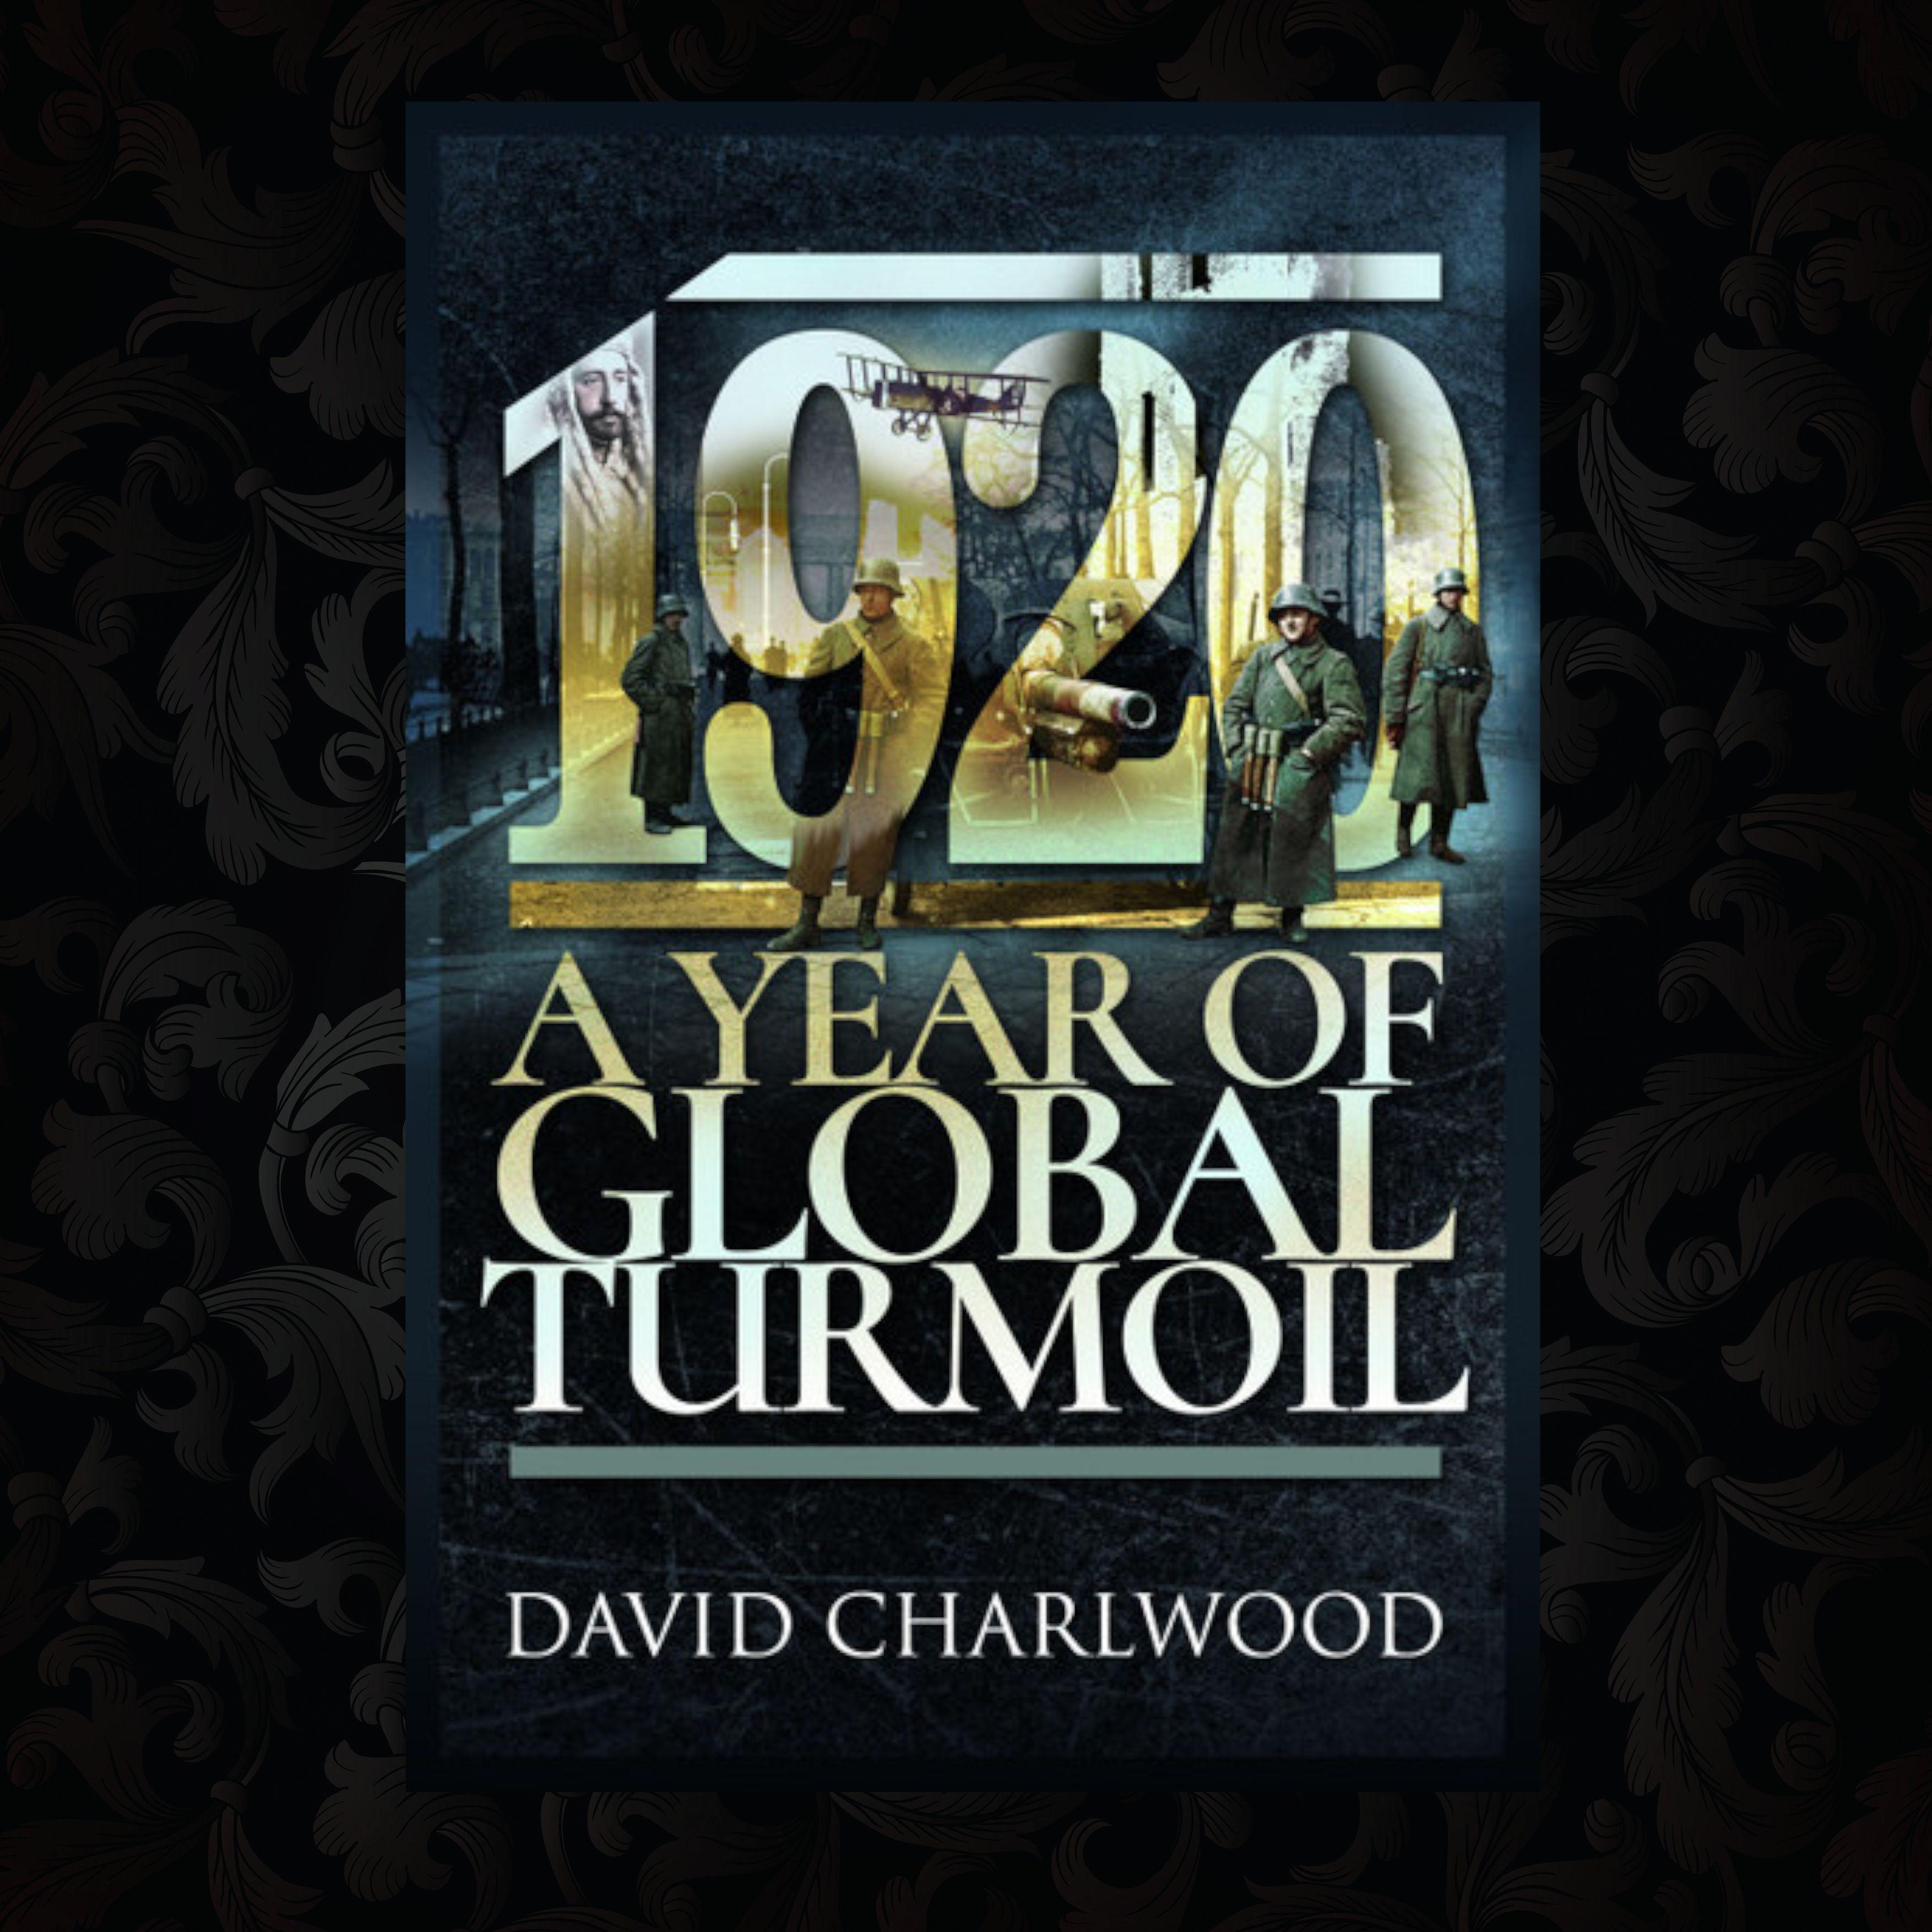 1920: A Year of Global Turmoil by David Charlwood #middleeast